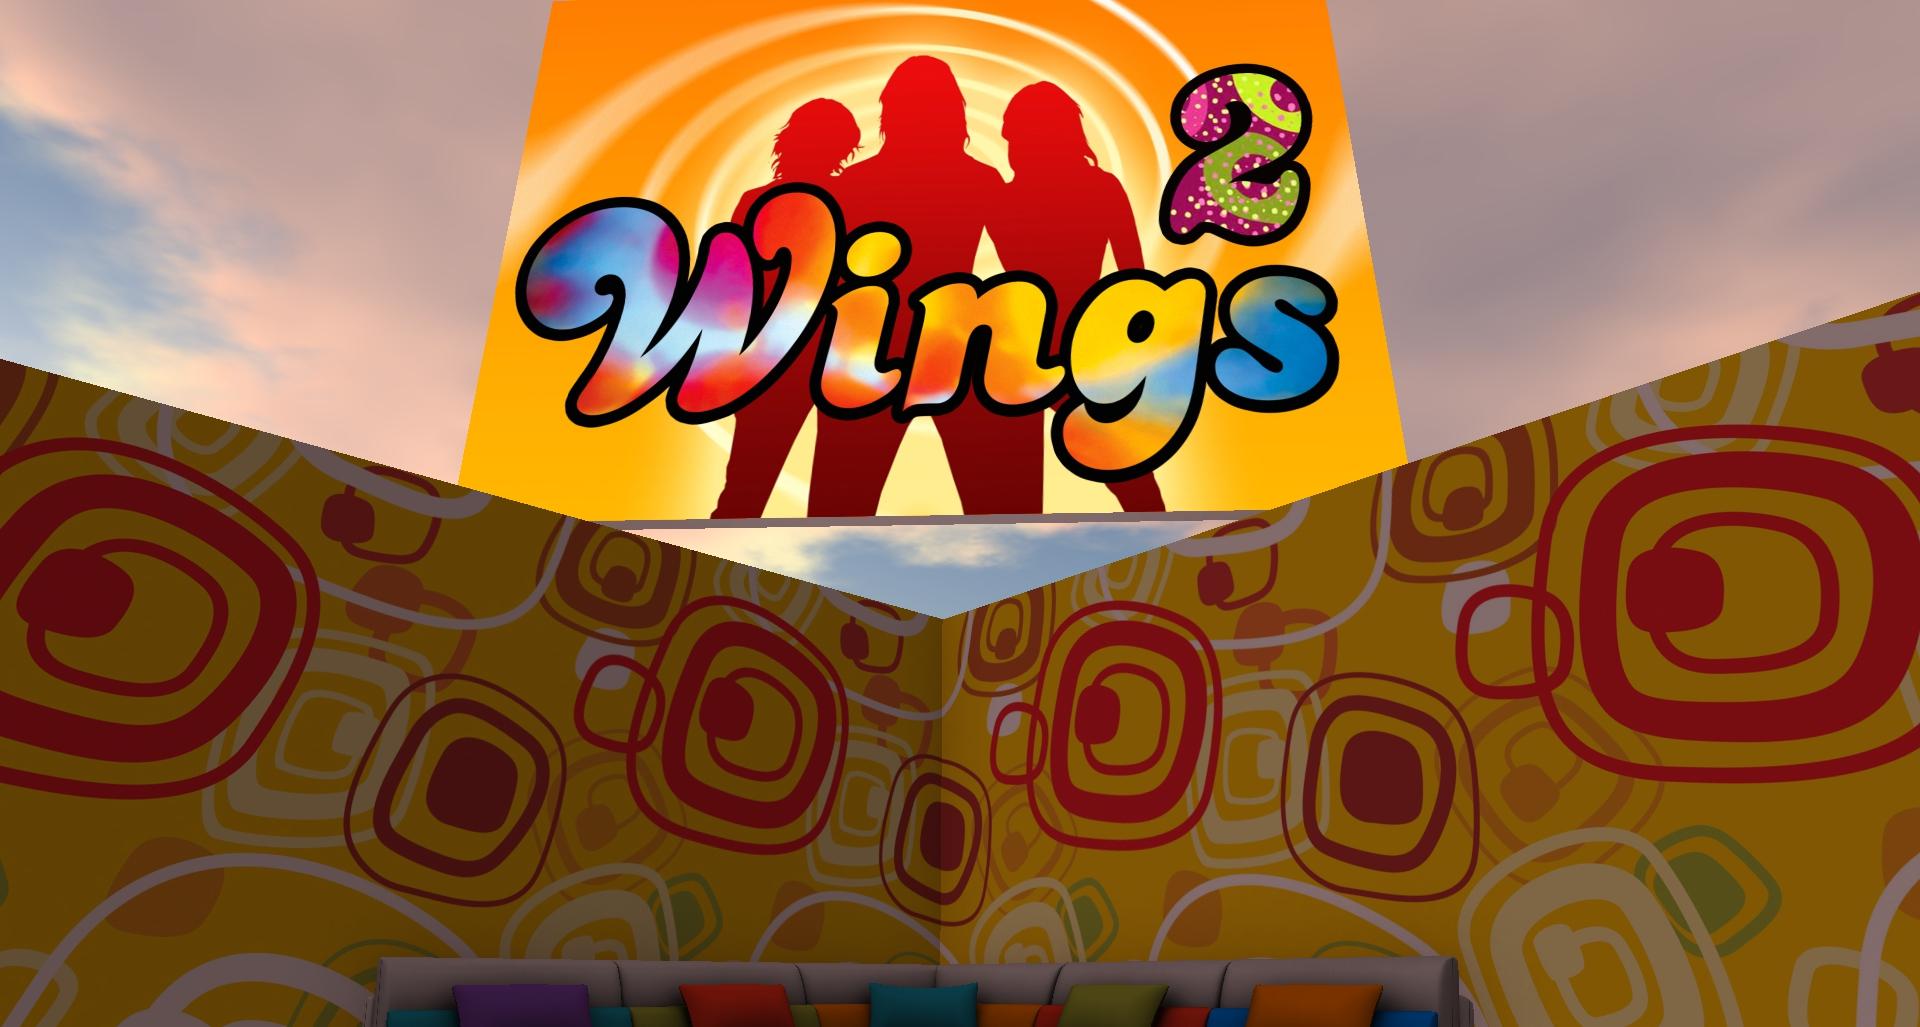 Wings 2 LHC - corner seating - Jan 2019_001.jpg